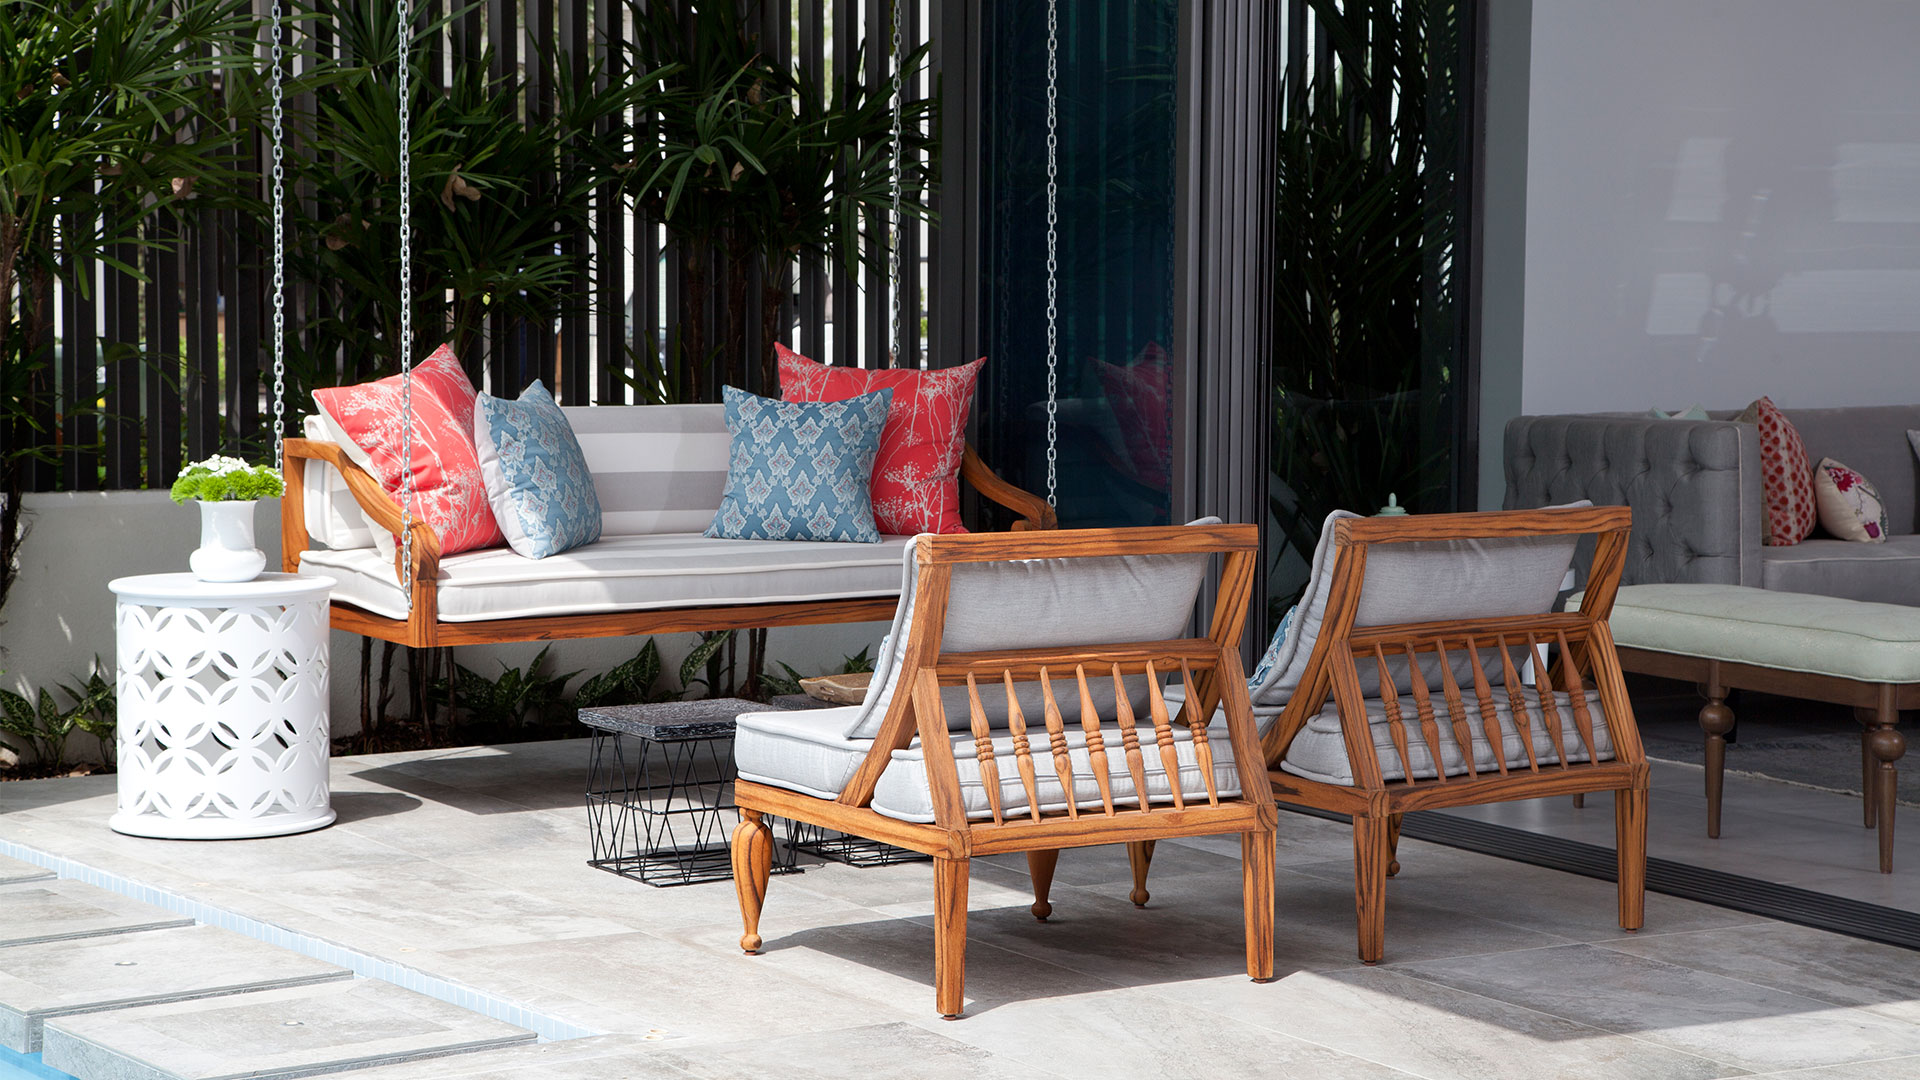 furniture-design-3.jpg